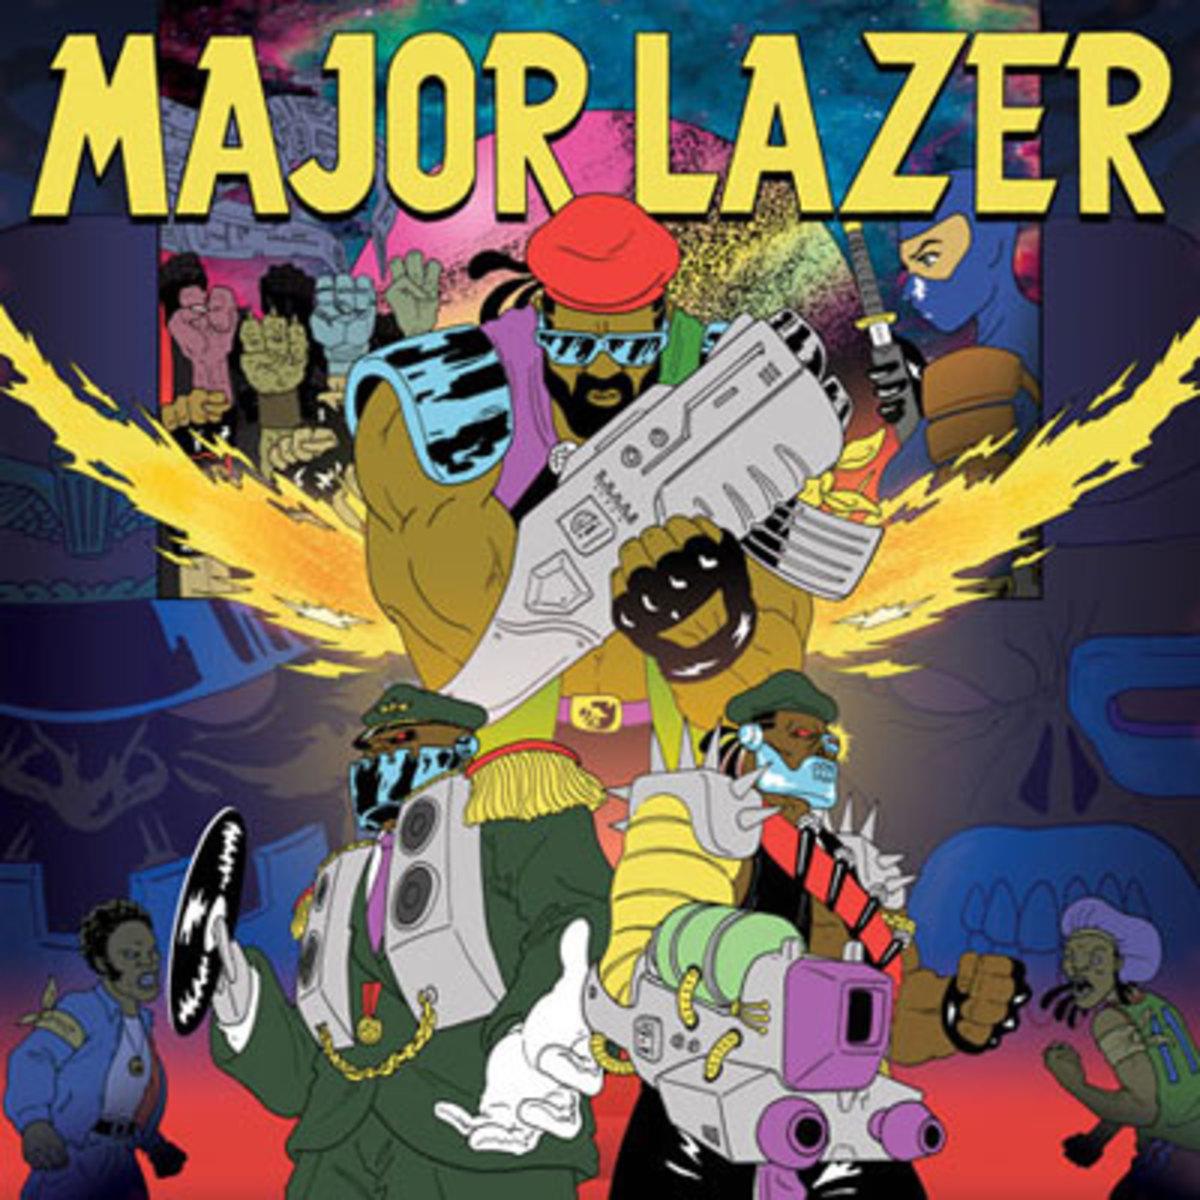 majorlazer-freetheuniverse.jpg